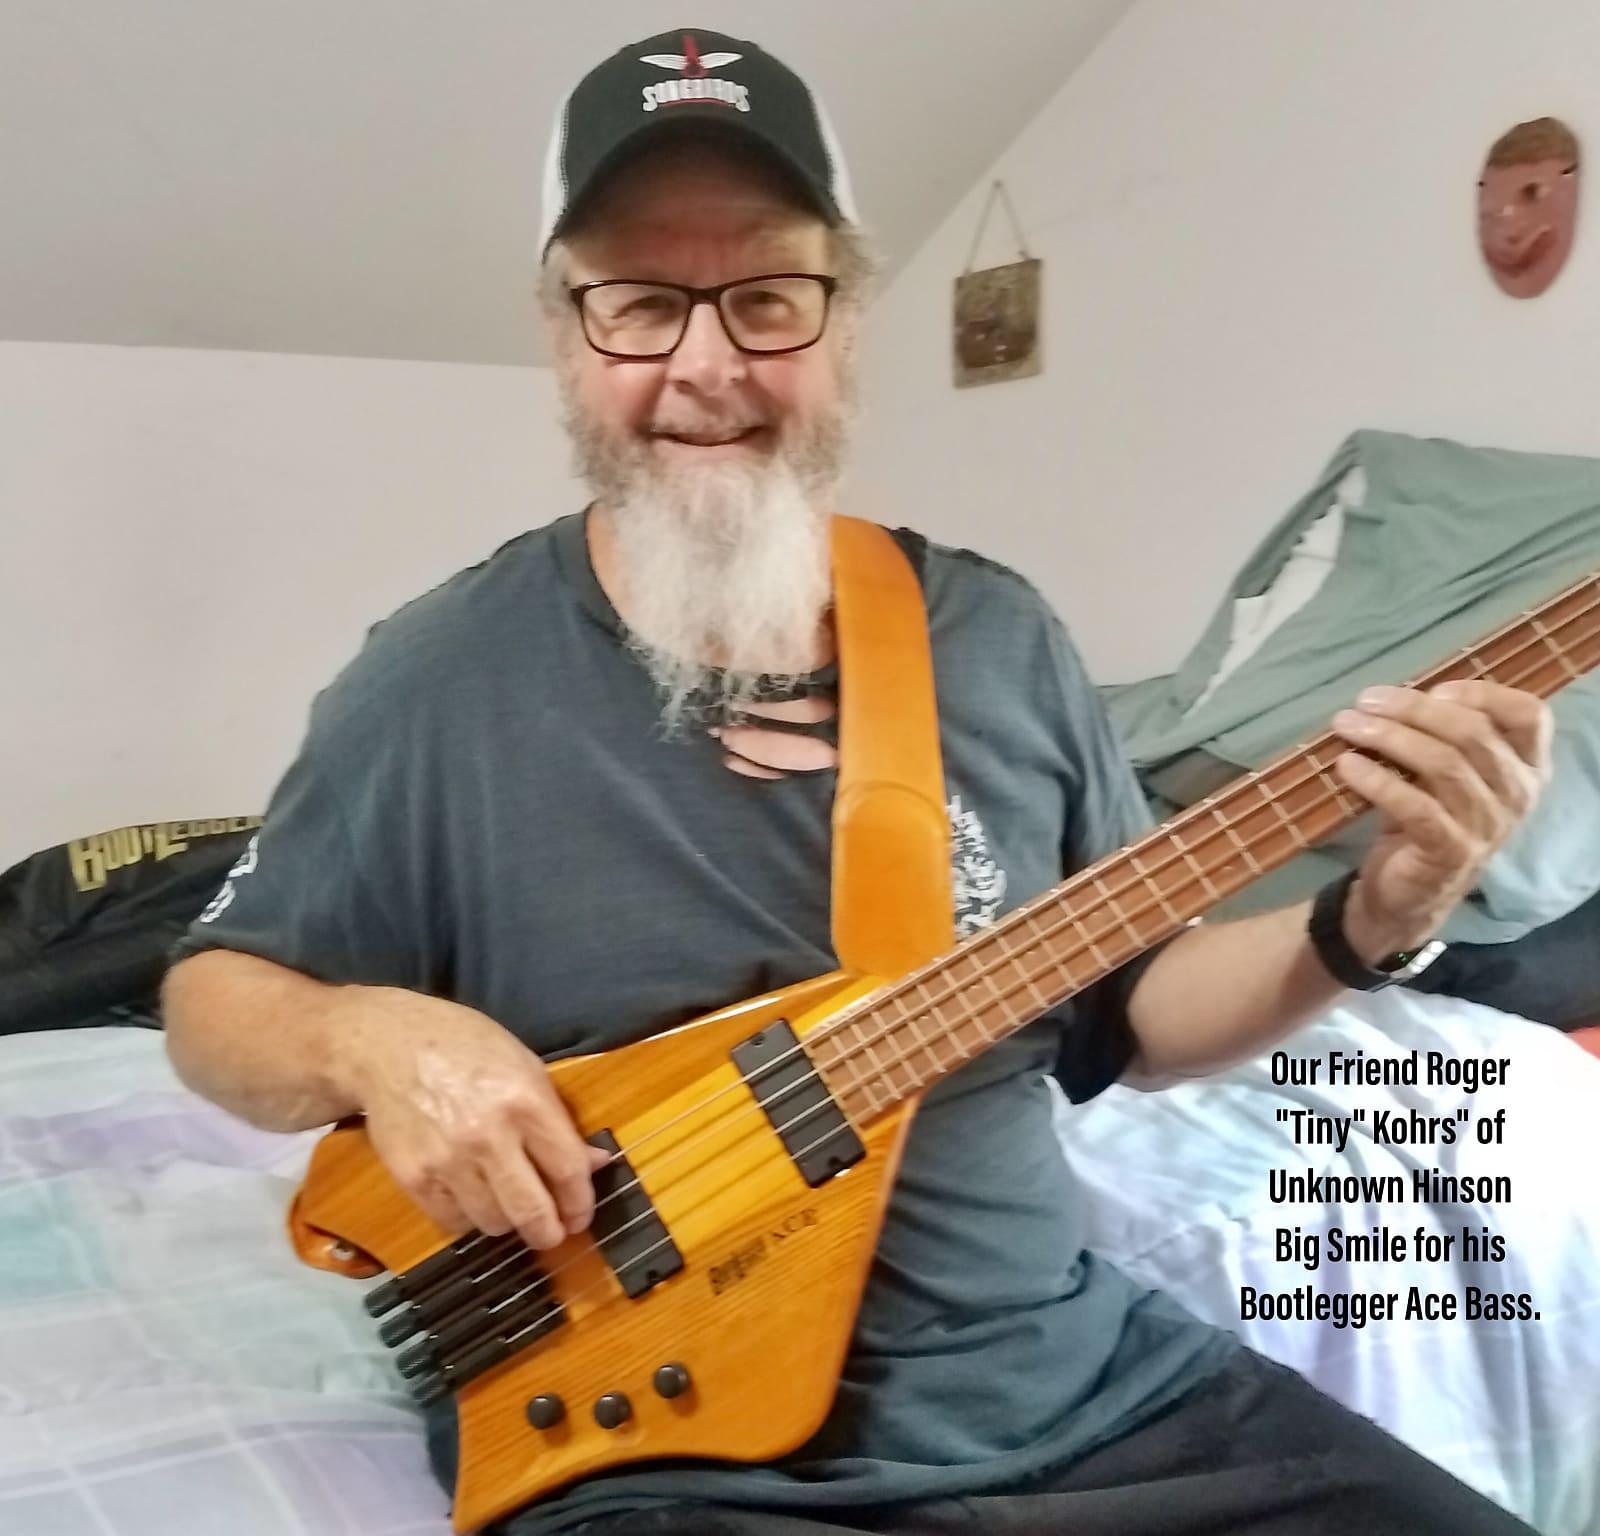 Bootlegger Guitar Ace 4 String Bass With Case